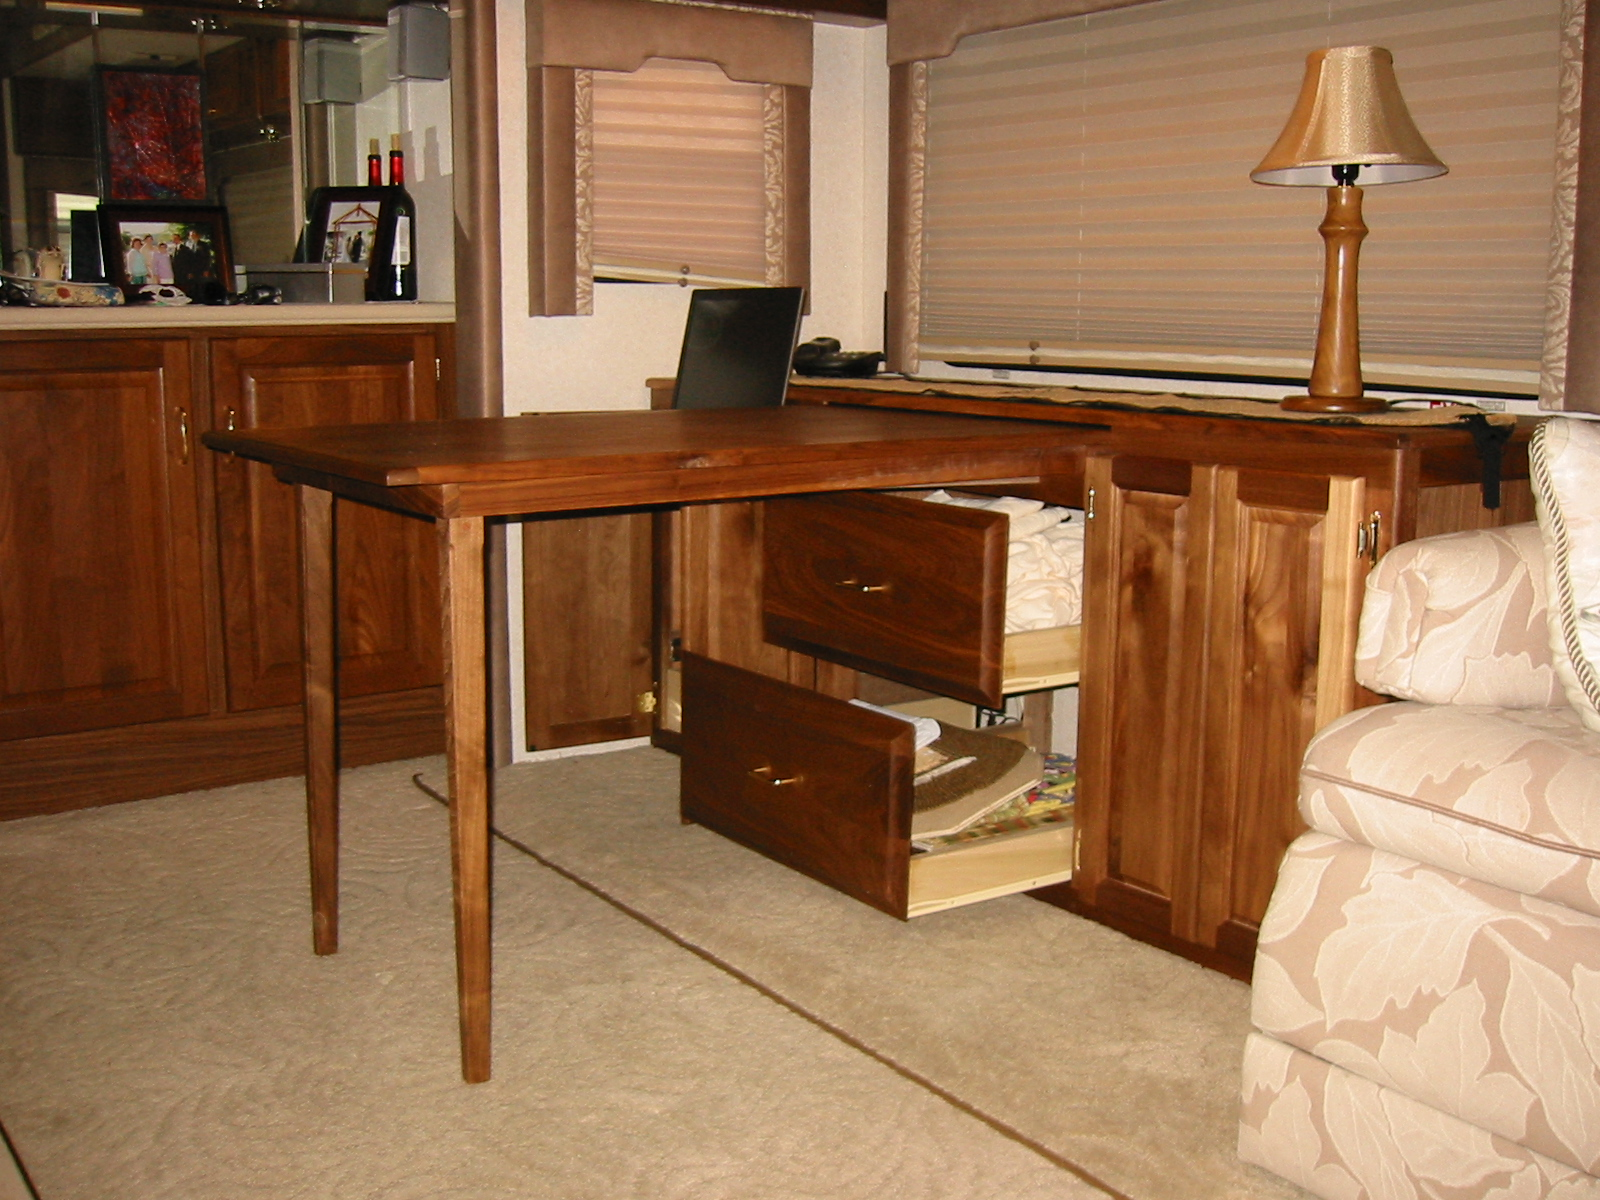 Click image for larger version  Name:RV desk 3.jpg Views:1701 Size:846.9 KB ID:26398